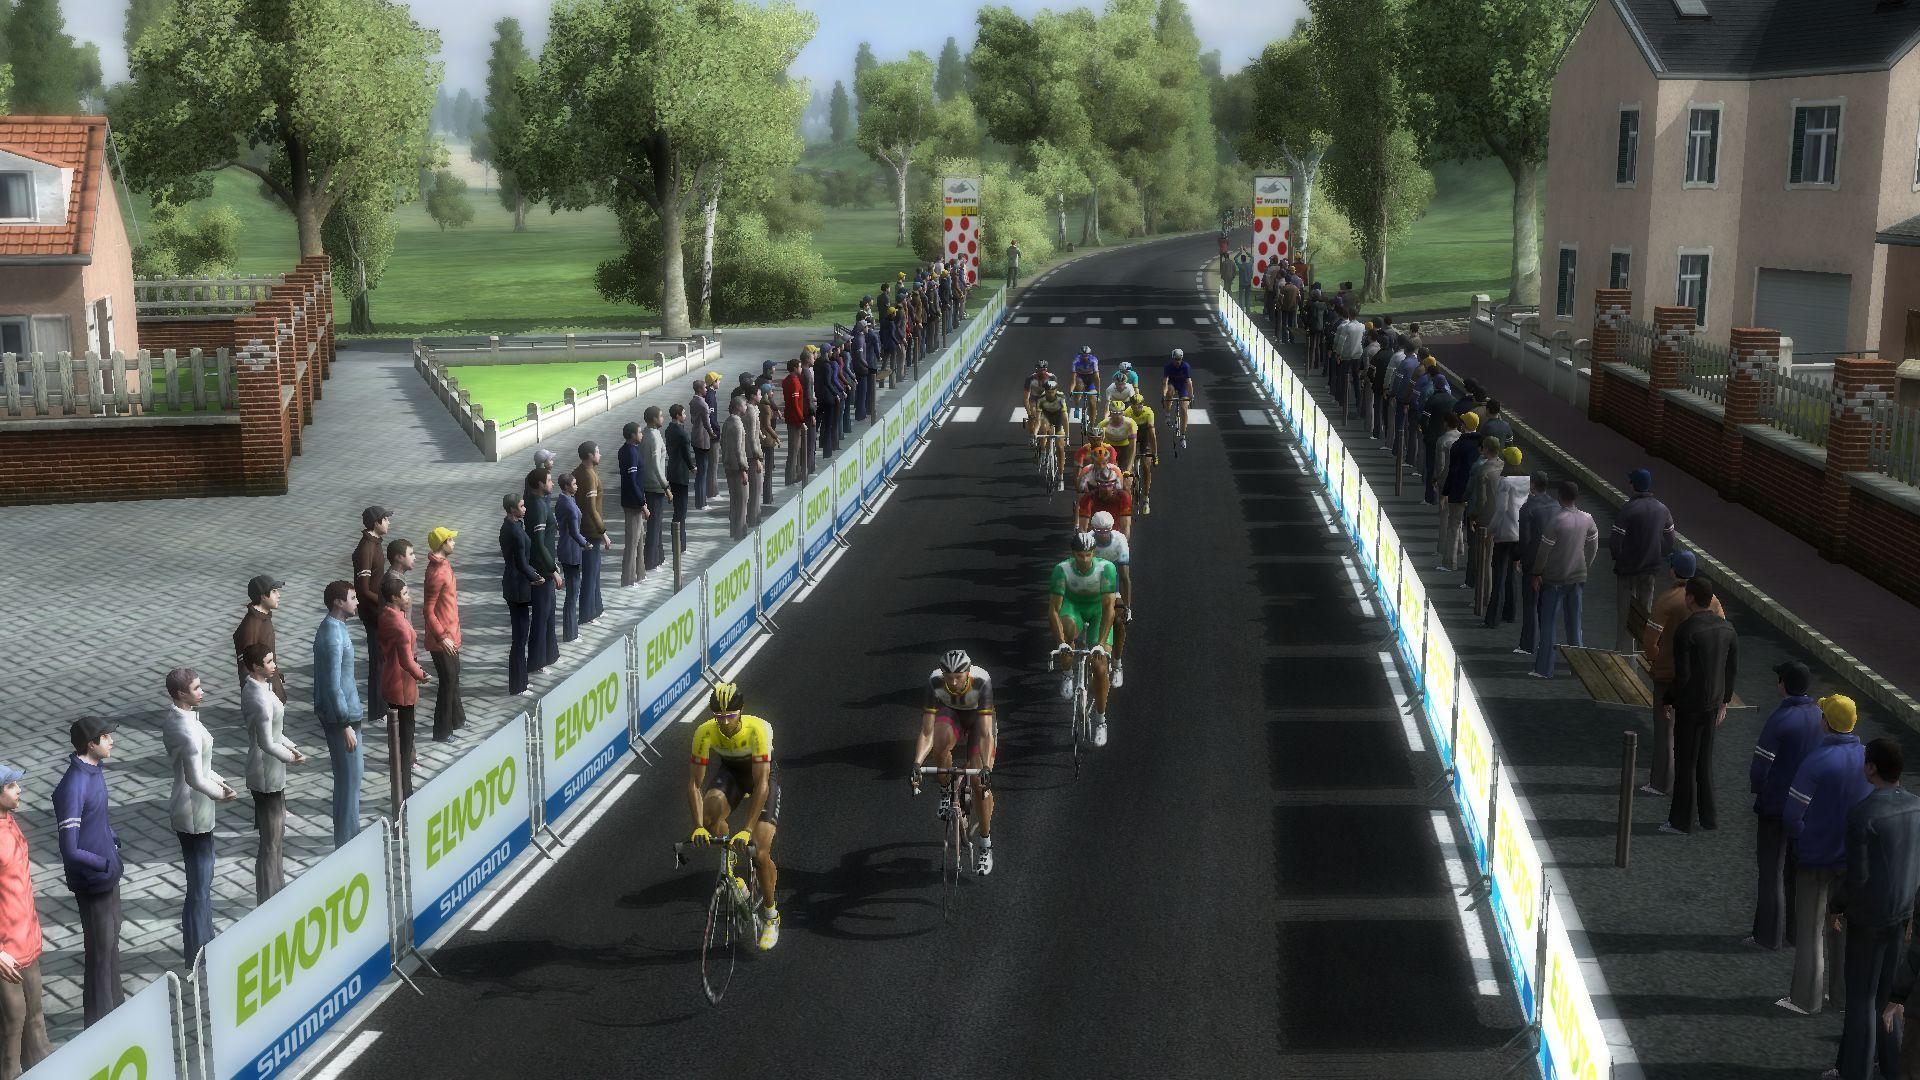 pcmdaily.com/images/mg/2017/Races/PT/TONE/TNES3%2015.jpg